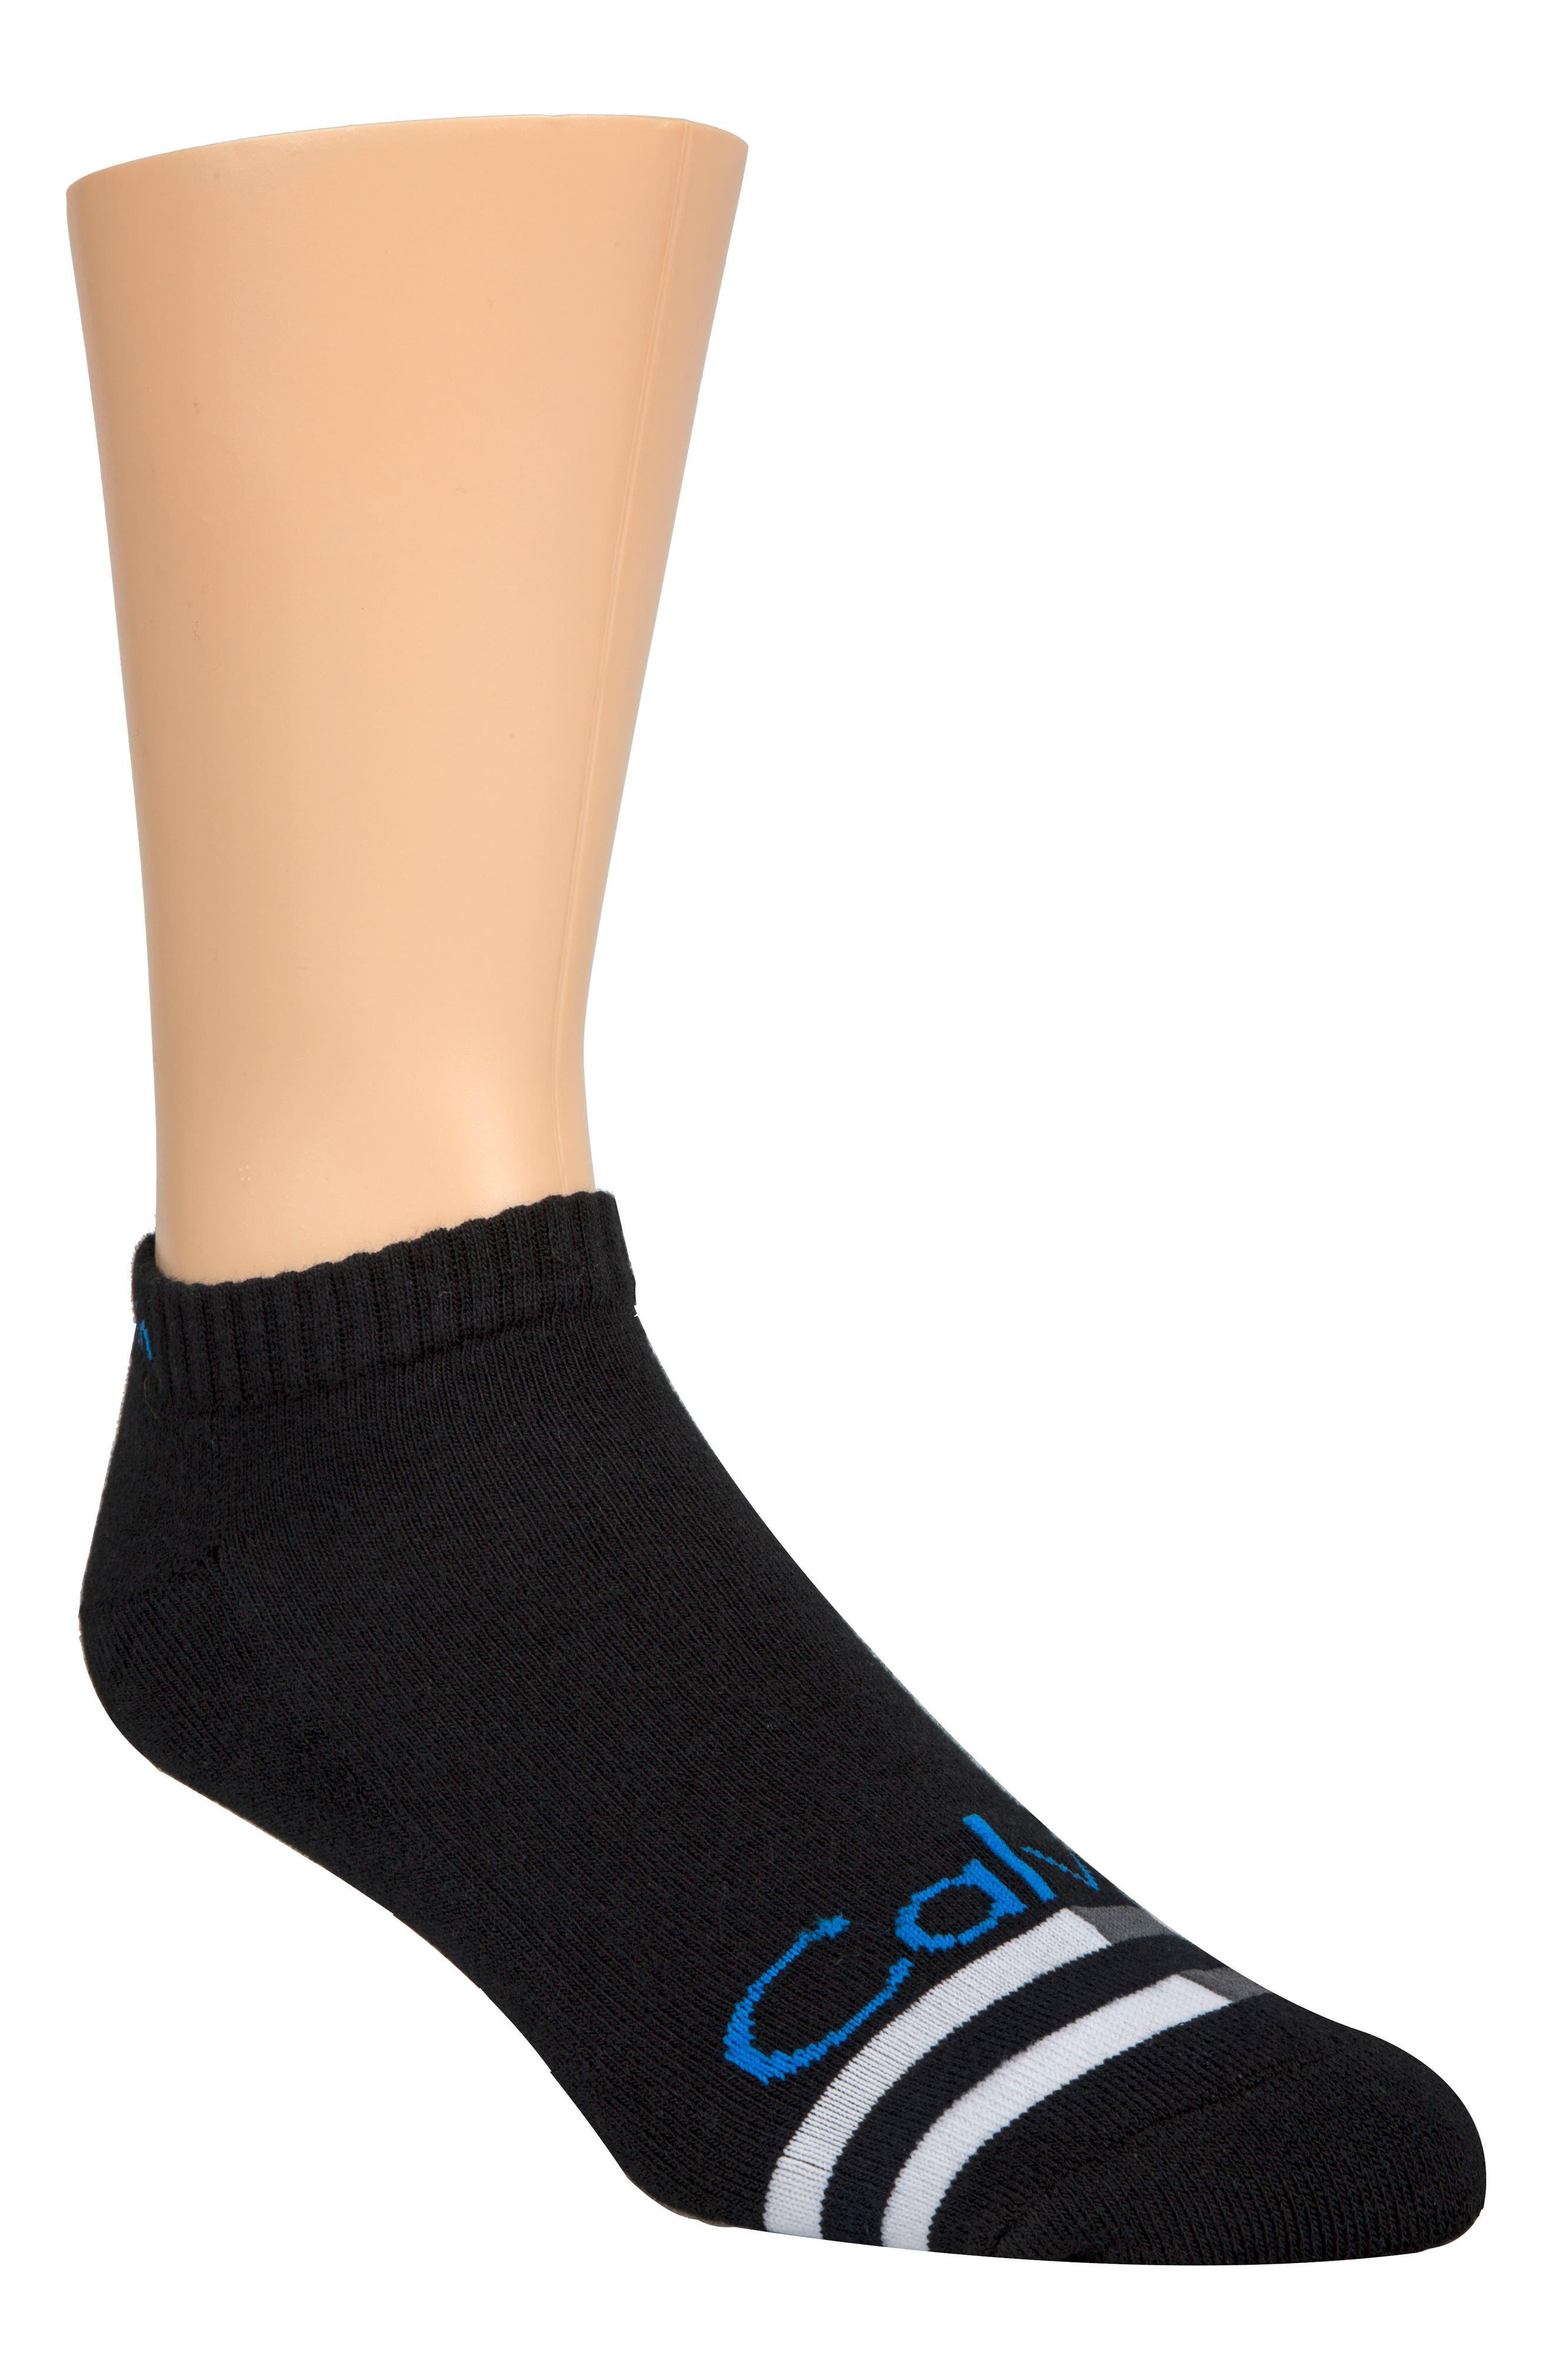 img balega the socks balegas point run running hidden are comfort ever review best comforter one